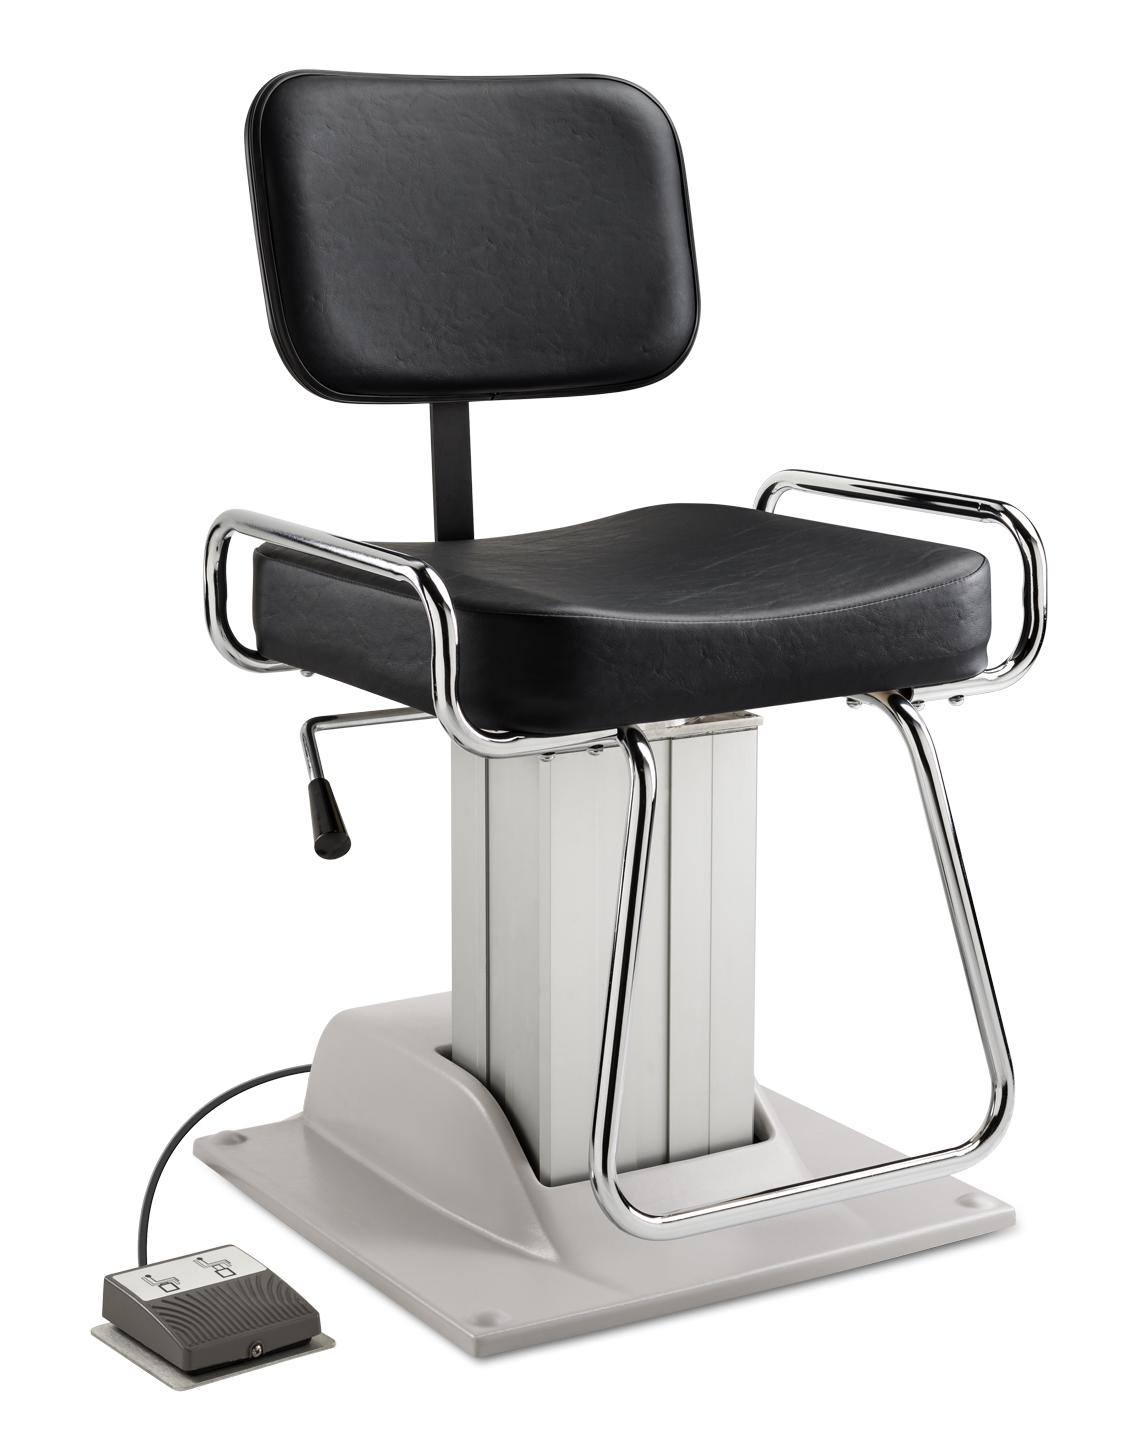 Reliance 2000 Laser Procedure Chair